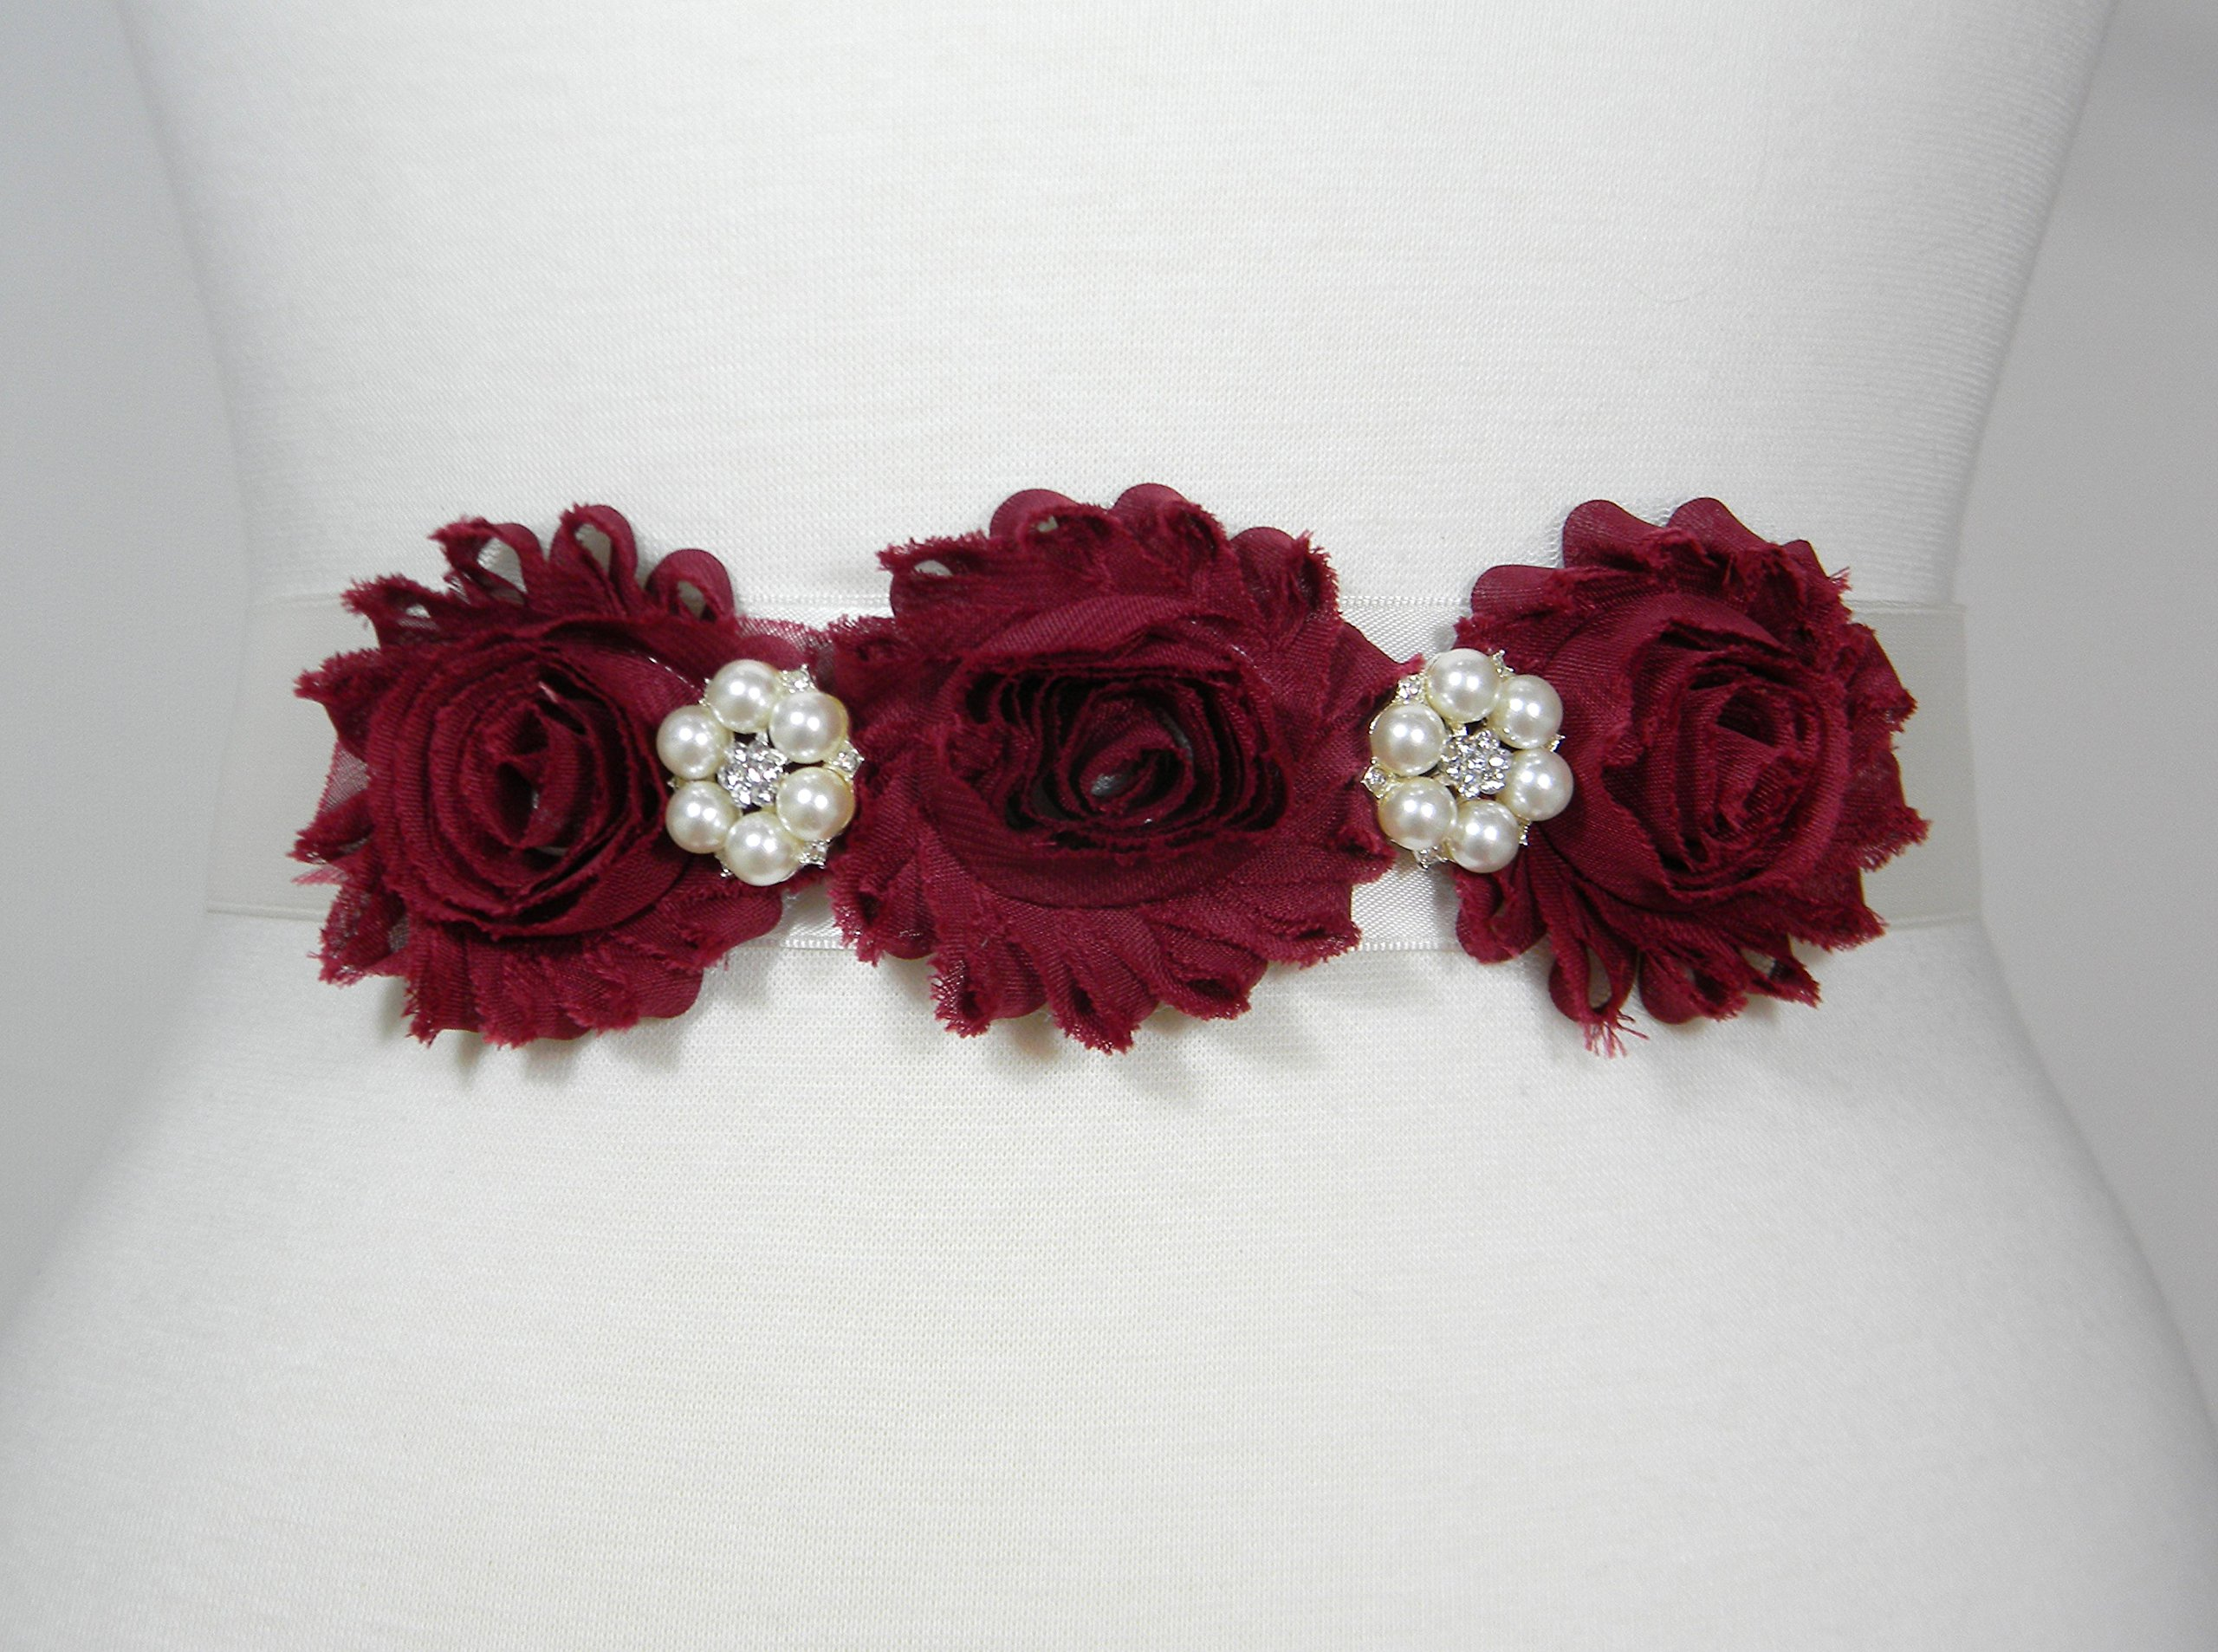 Maroon Flowers and Ivory Ribbon Bridal Belt, Wedding Belt, Bridal Sash, Flower Girl Dress Wedding Sashes, Pearl and Crystal Rhinestone Belts, ELSA